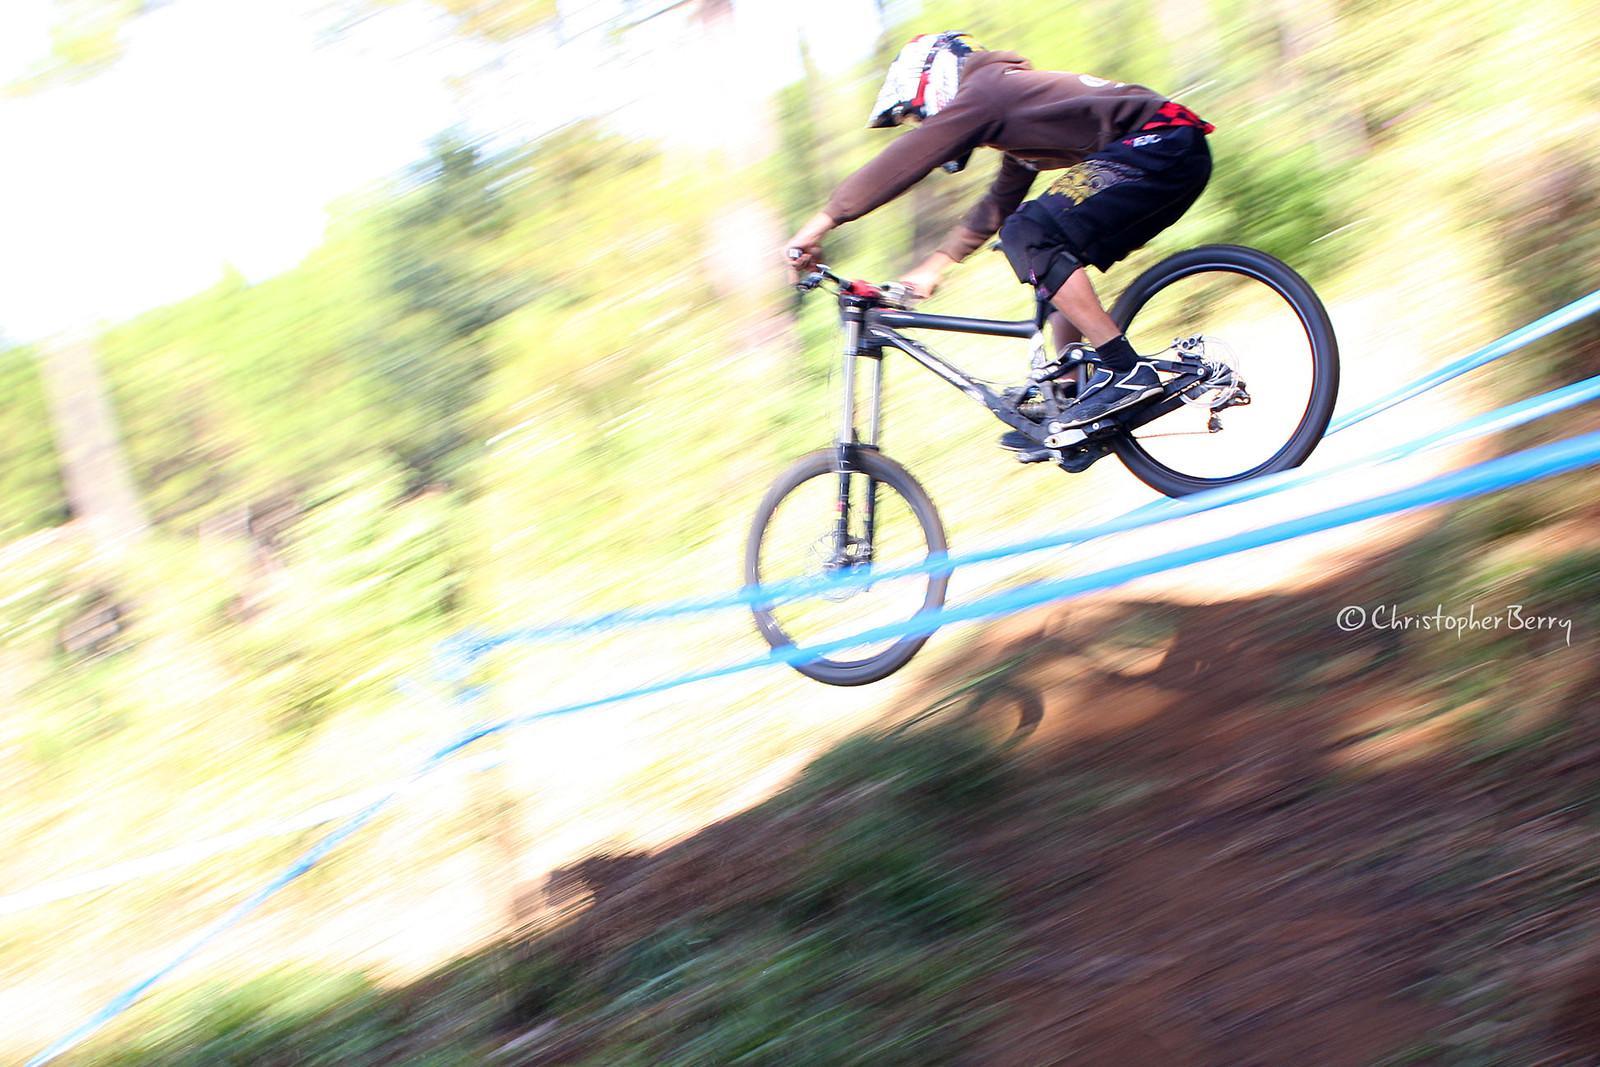 ShimanoUKDIseri02 - 0304 -mod - ombei - Mountain Biking Pictures - Vital MTB